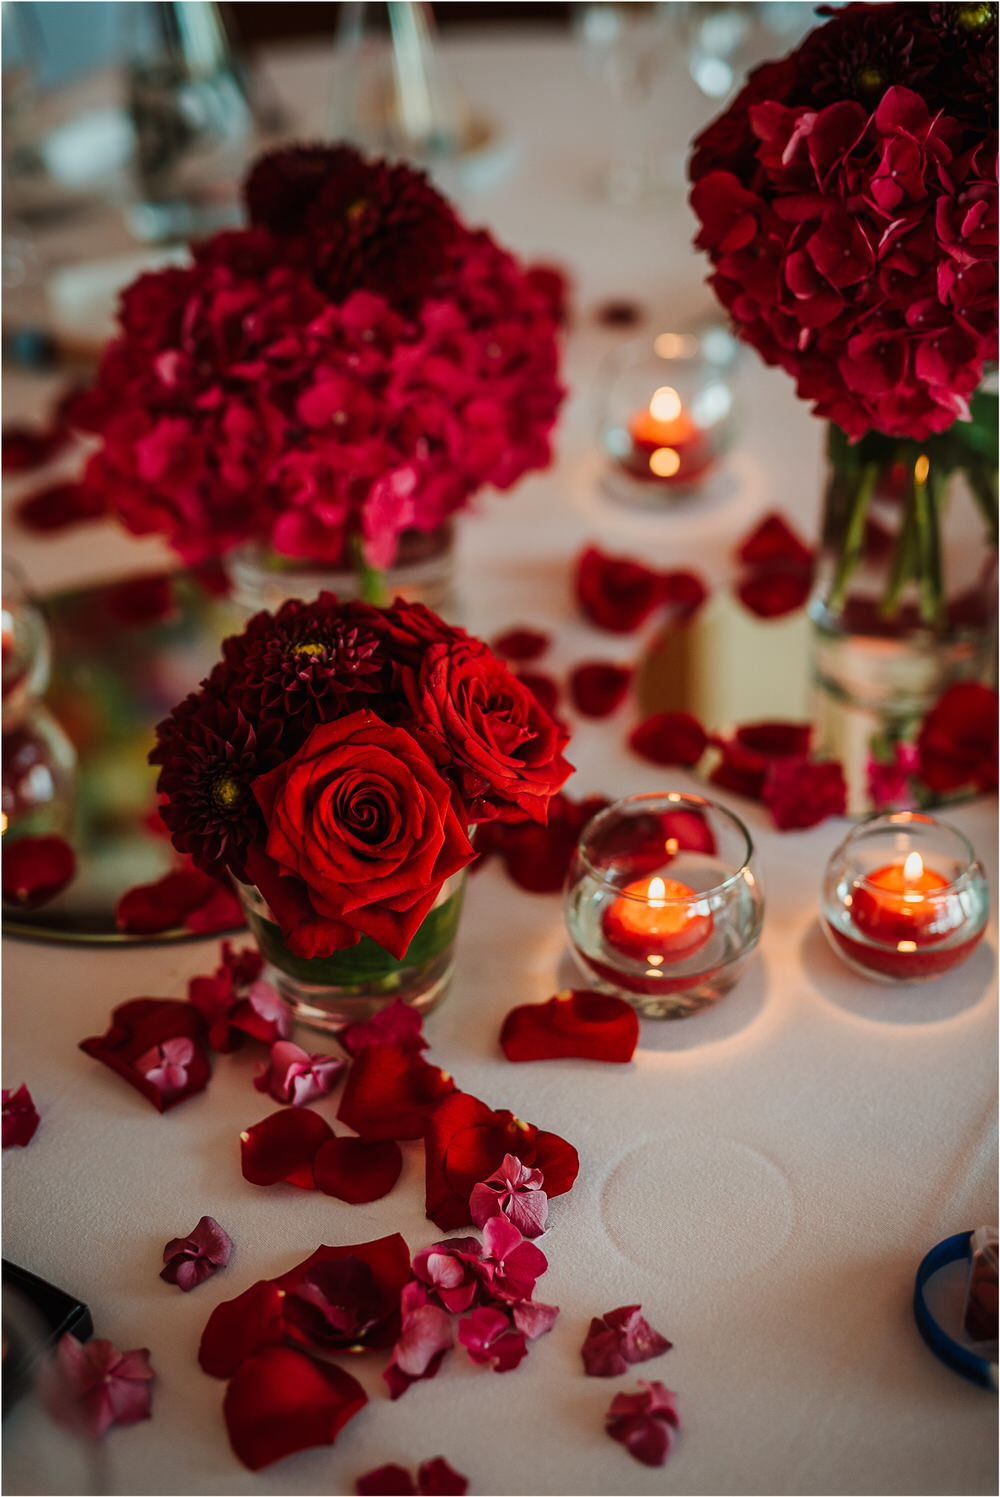 evian france wedding photographer photographer hotel royale rockabilly wedding poroka tematska nika grega themed wedding 0075.jpg